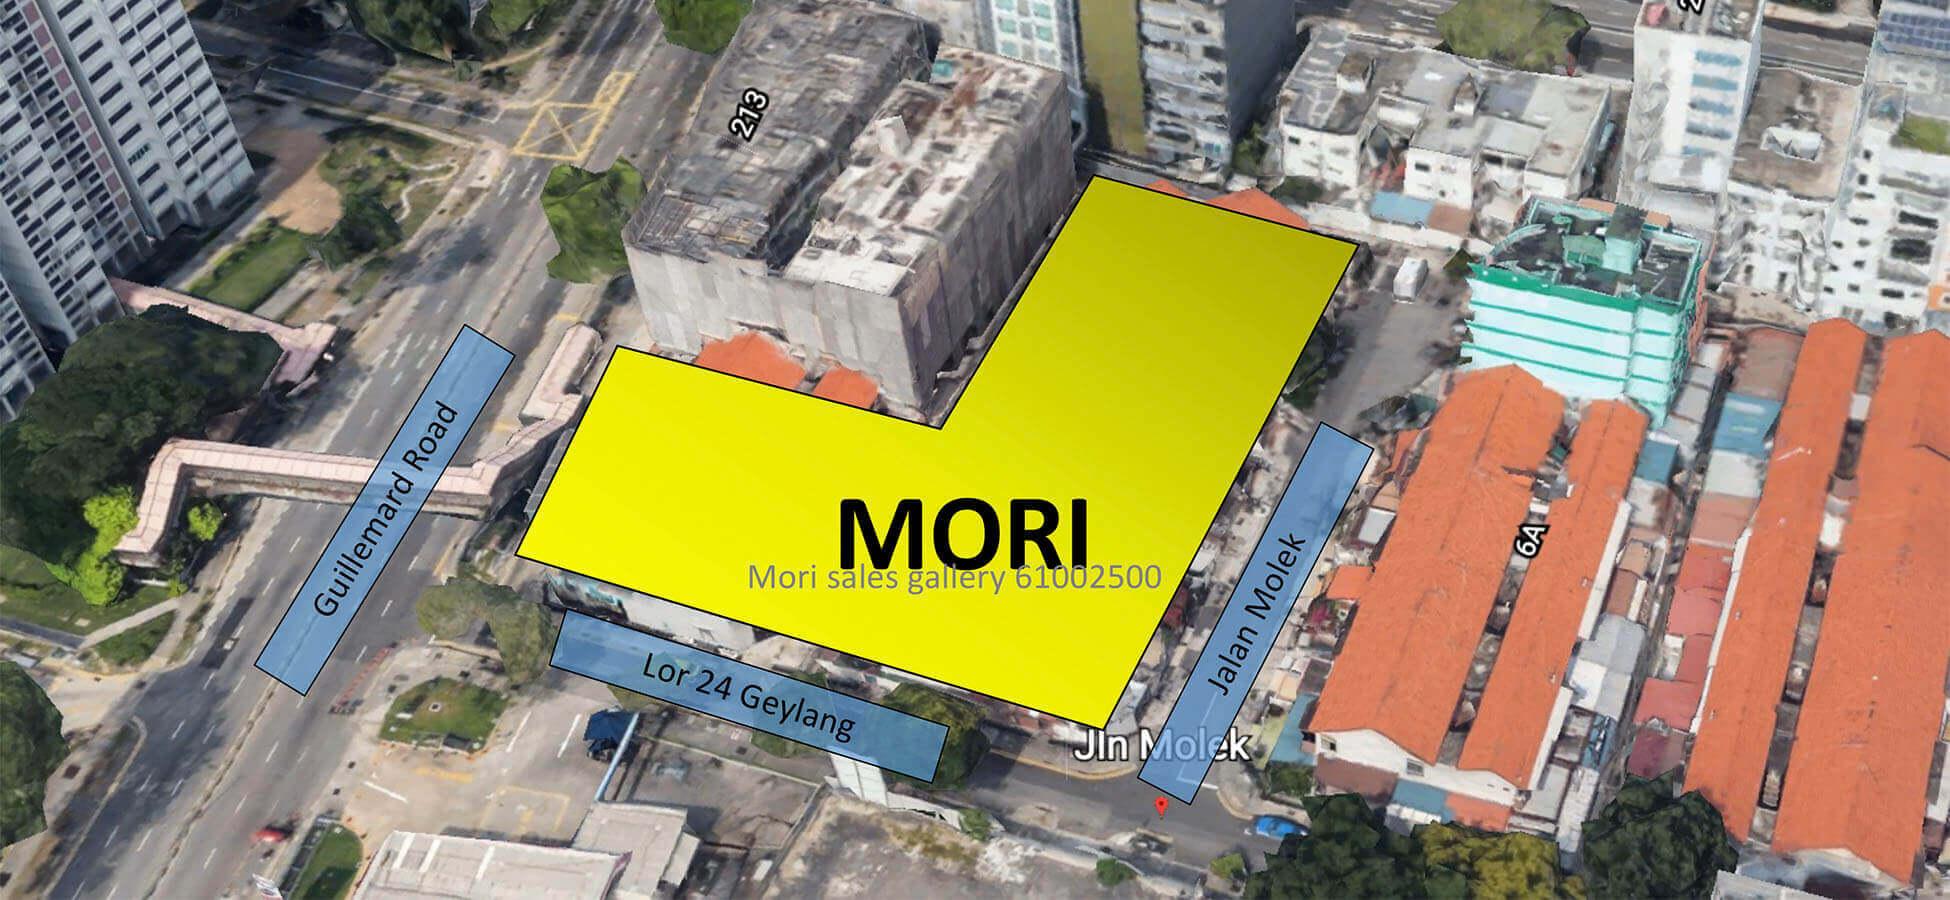 Mori New Condo Actual Site